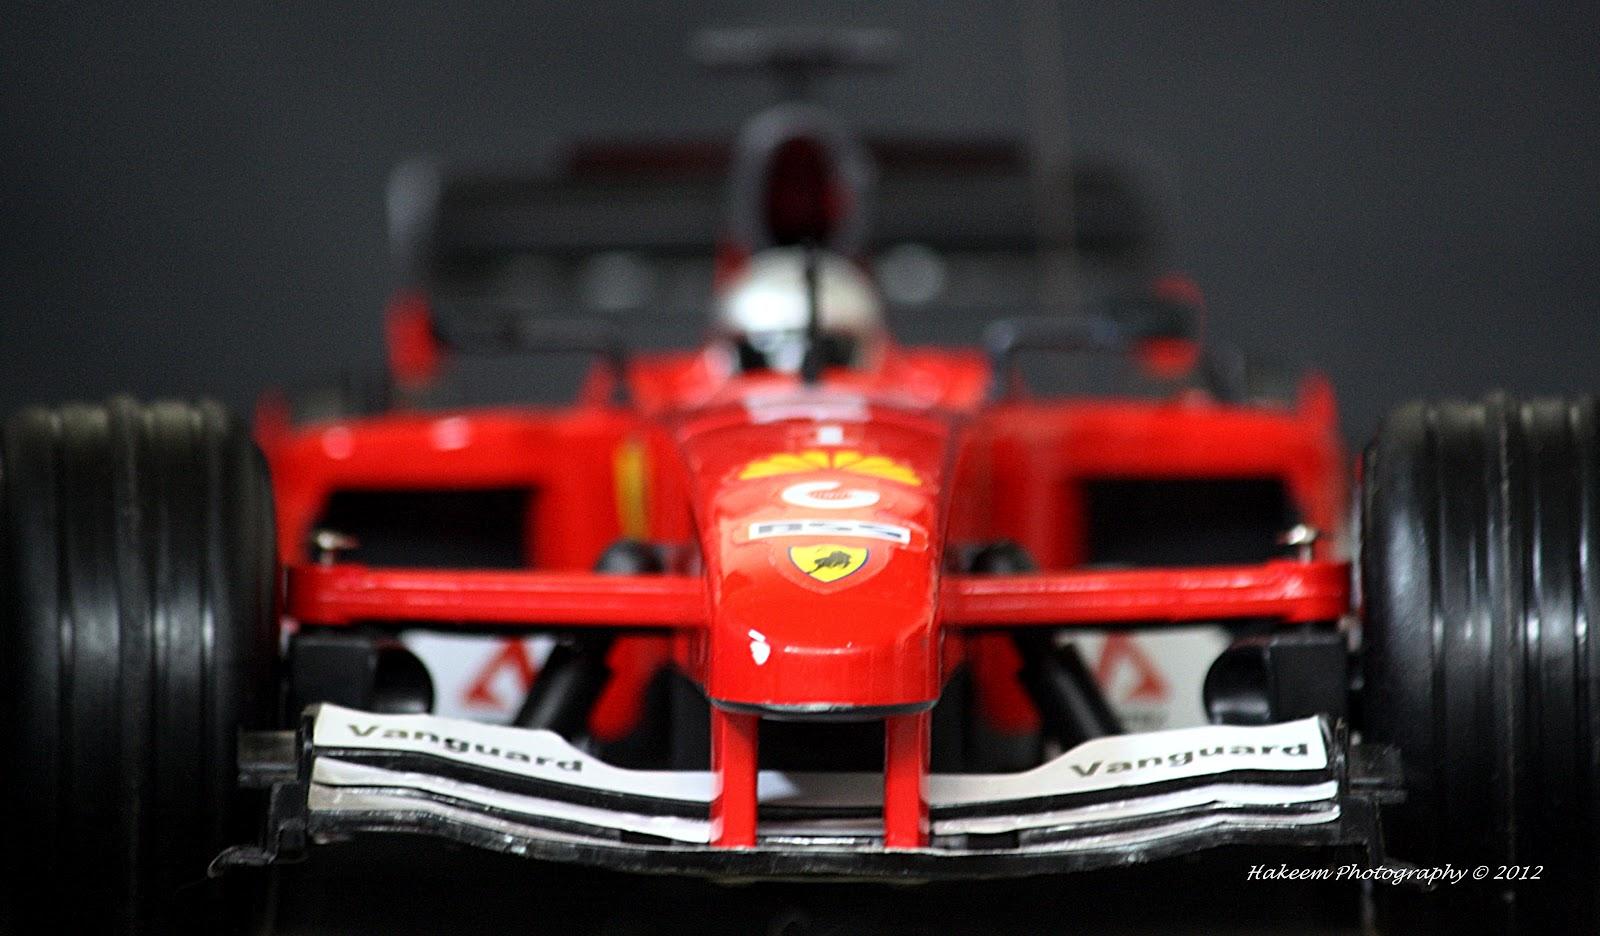 `F1 R/C Racing Car